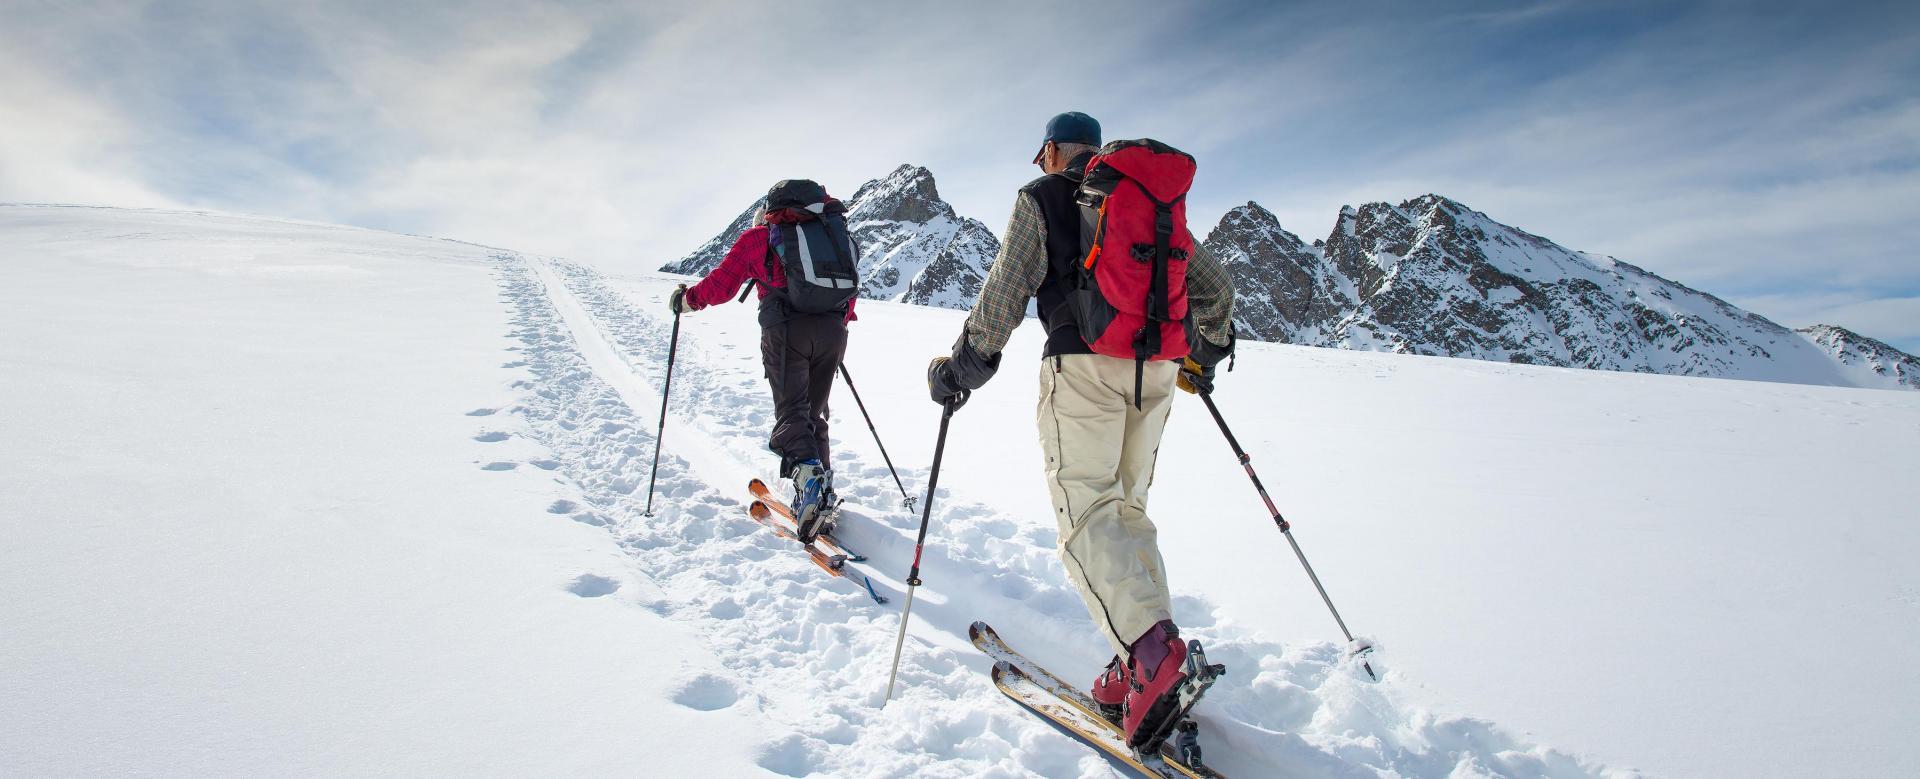 Voyage à la neige : Ski de rando autour du triglav